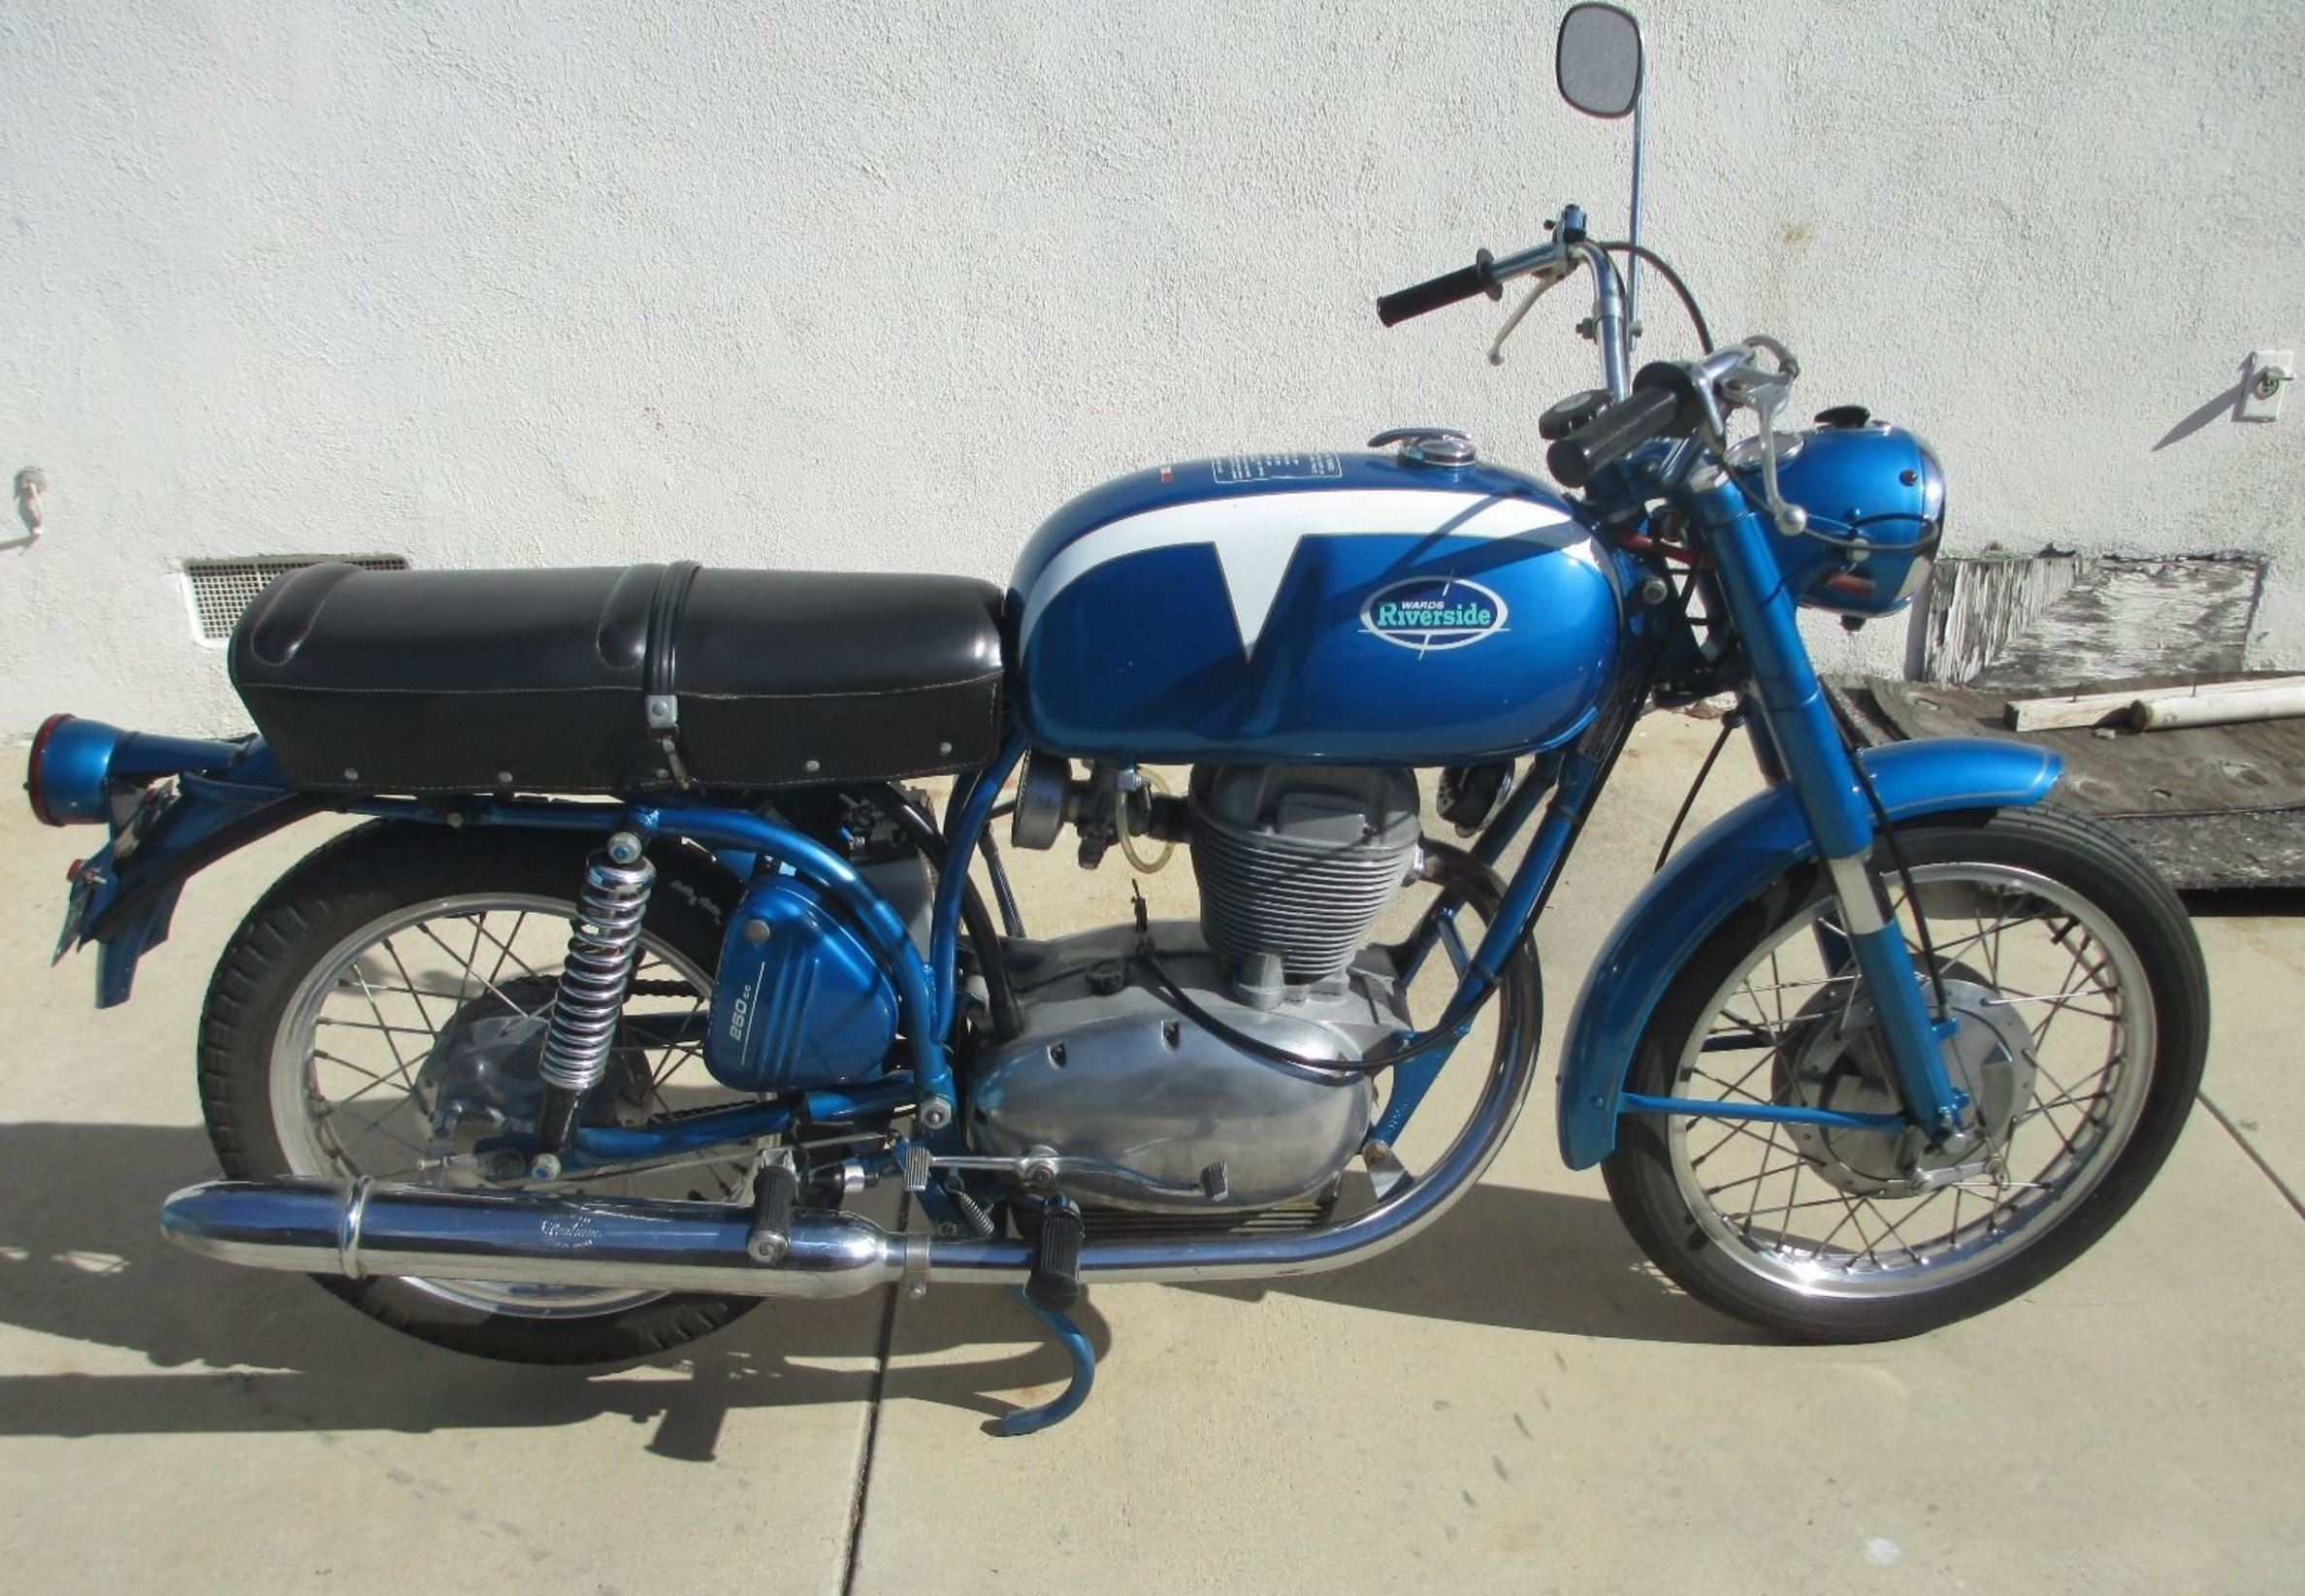 1967 wards riverside 250 benelli bike urious rh bike urious com Benelli 250 Motorcycle Benelli 150